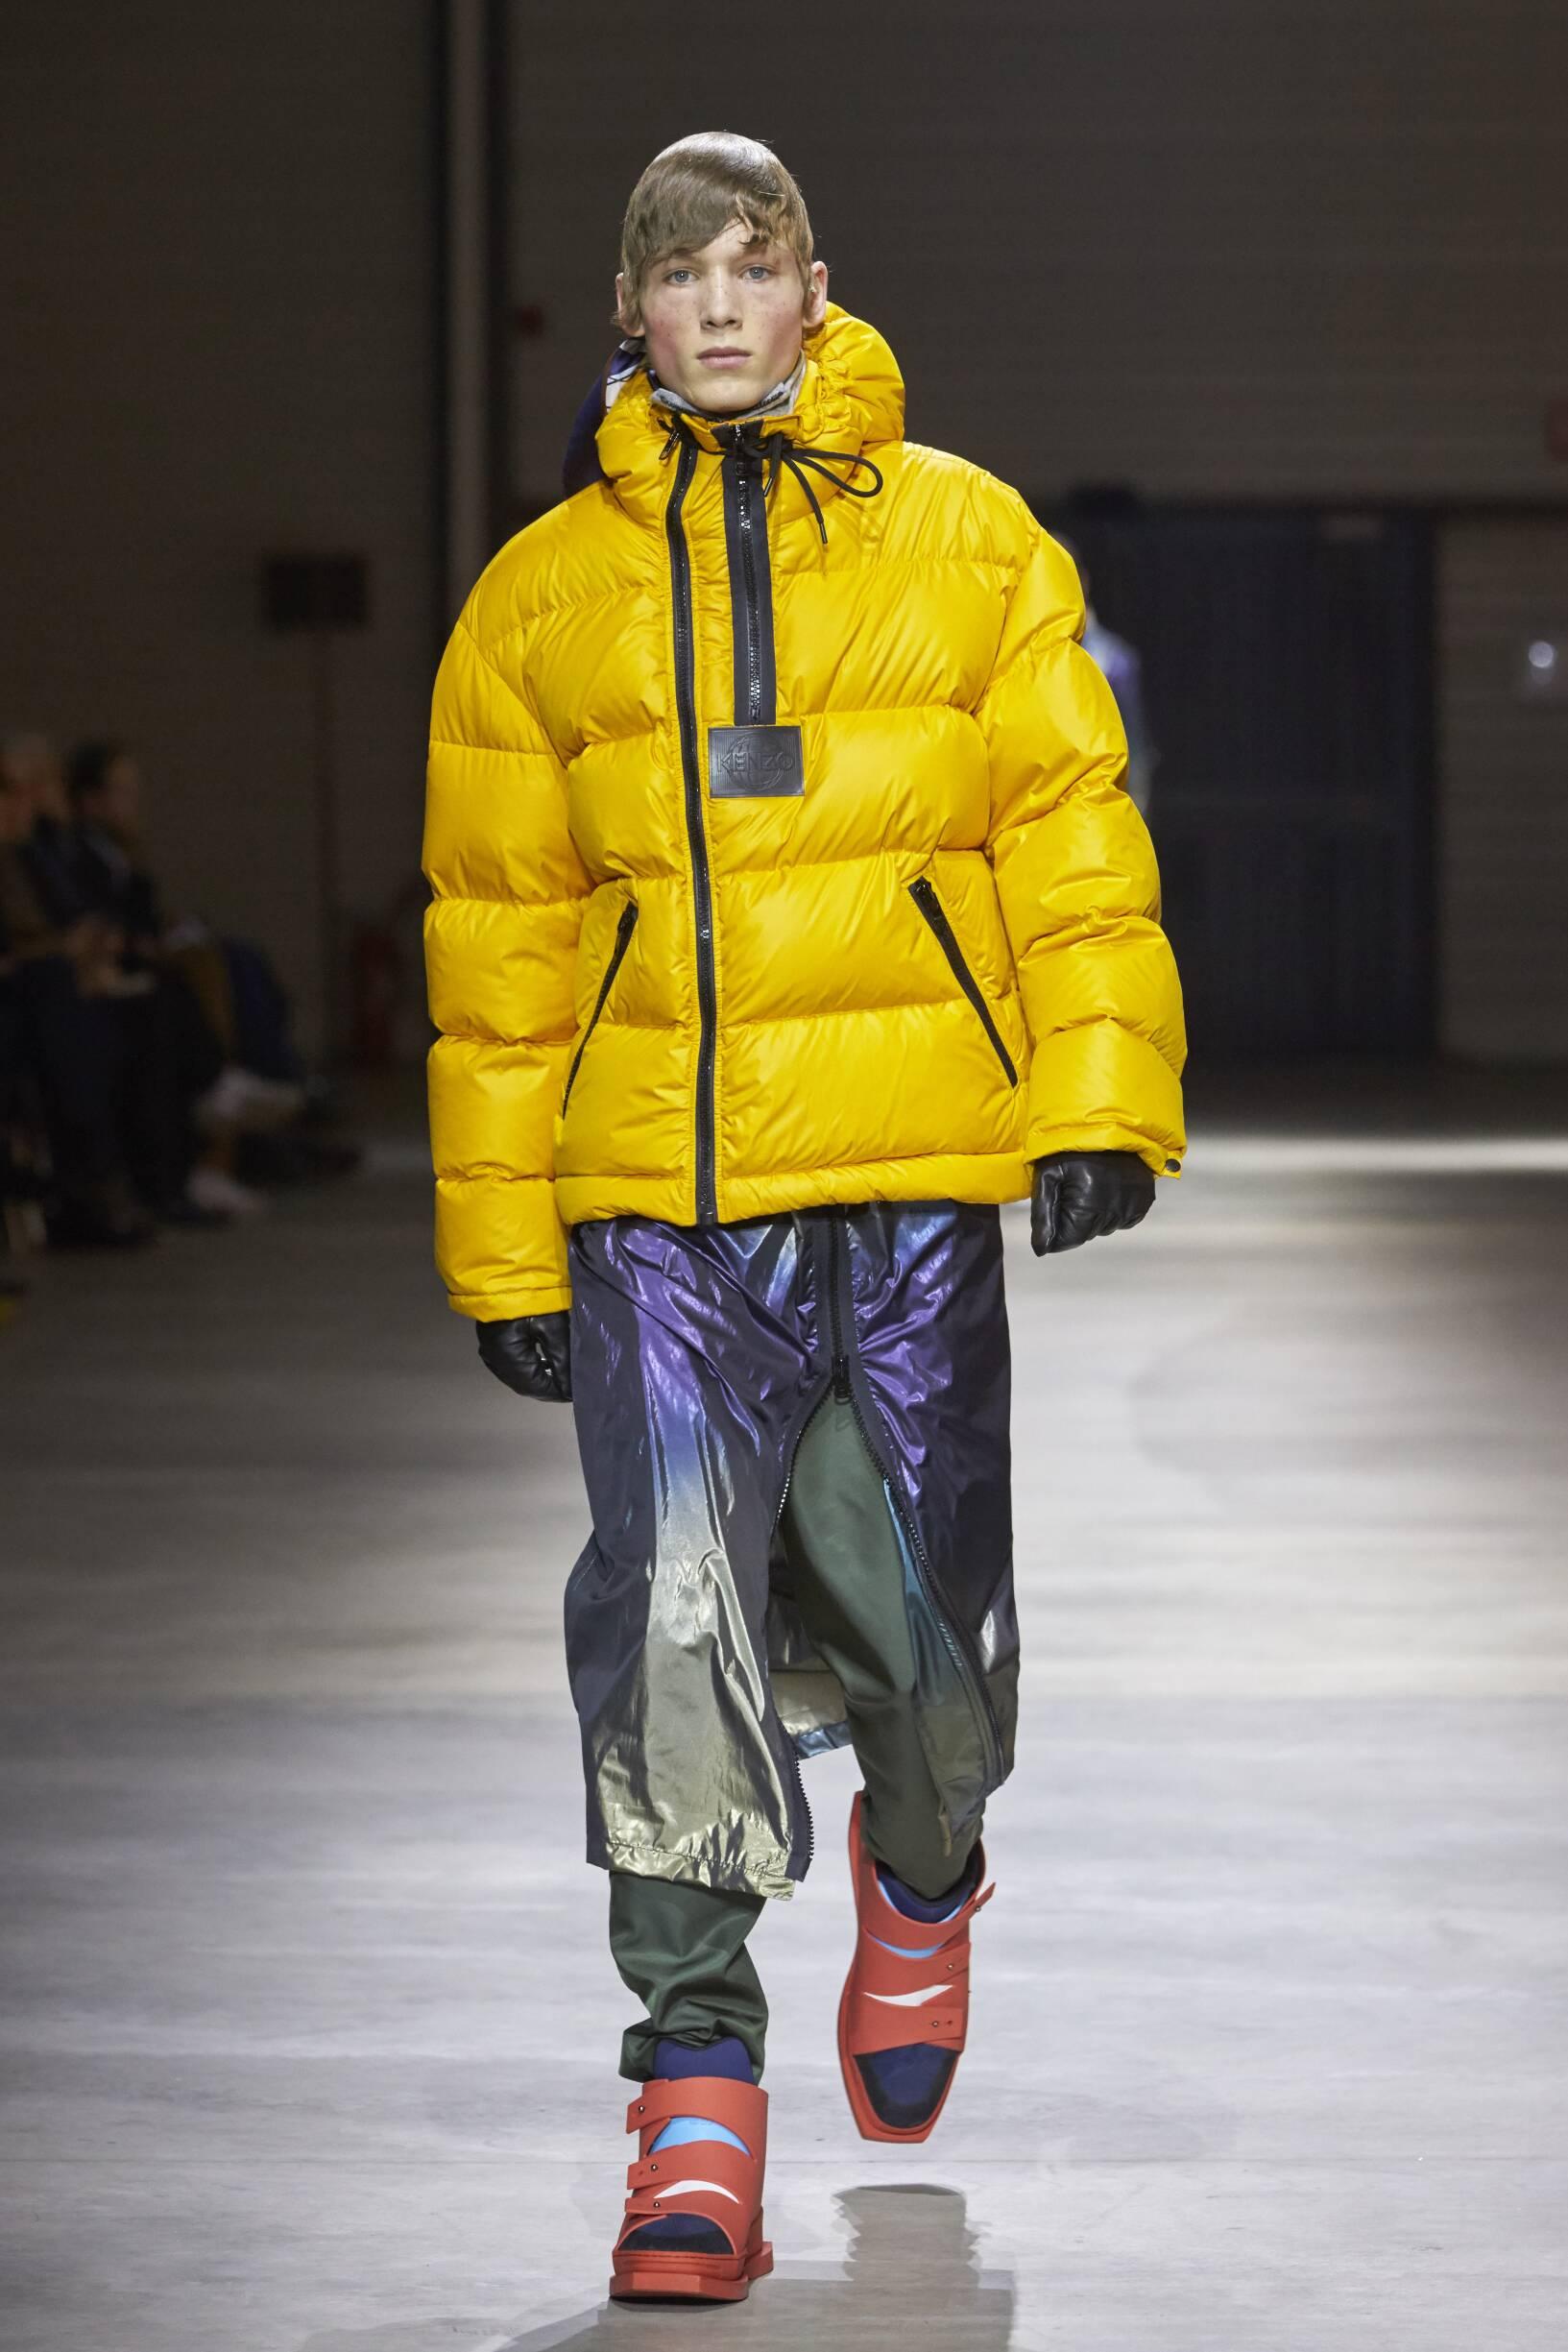 Kenzo Man Winter 2017 Catwalk